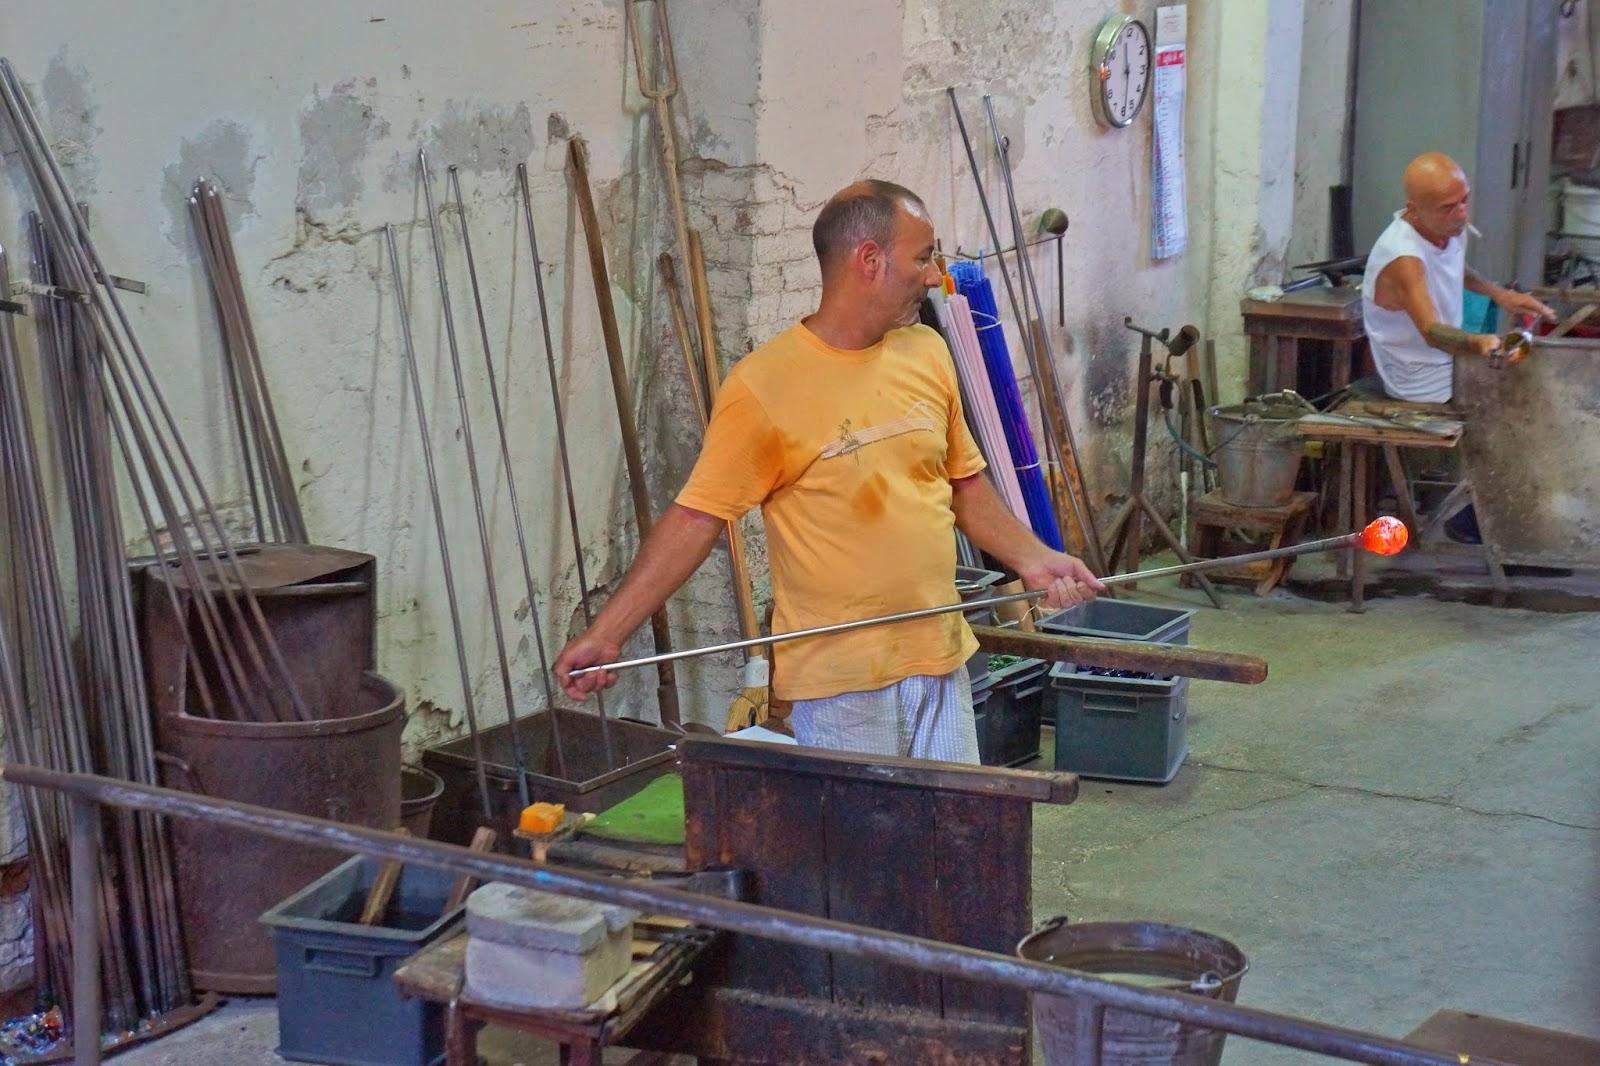 Glassfactory in Murano, Italy.